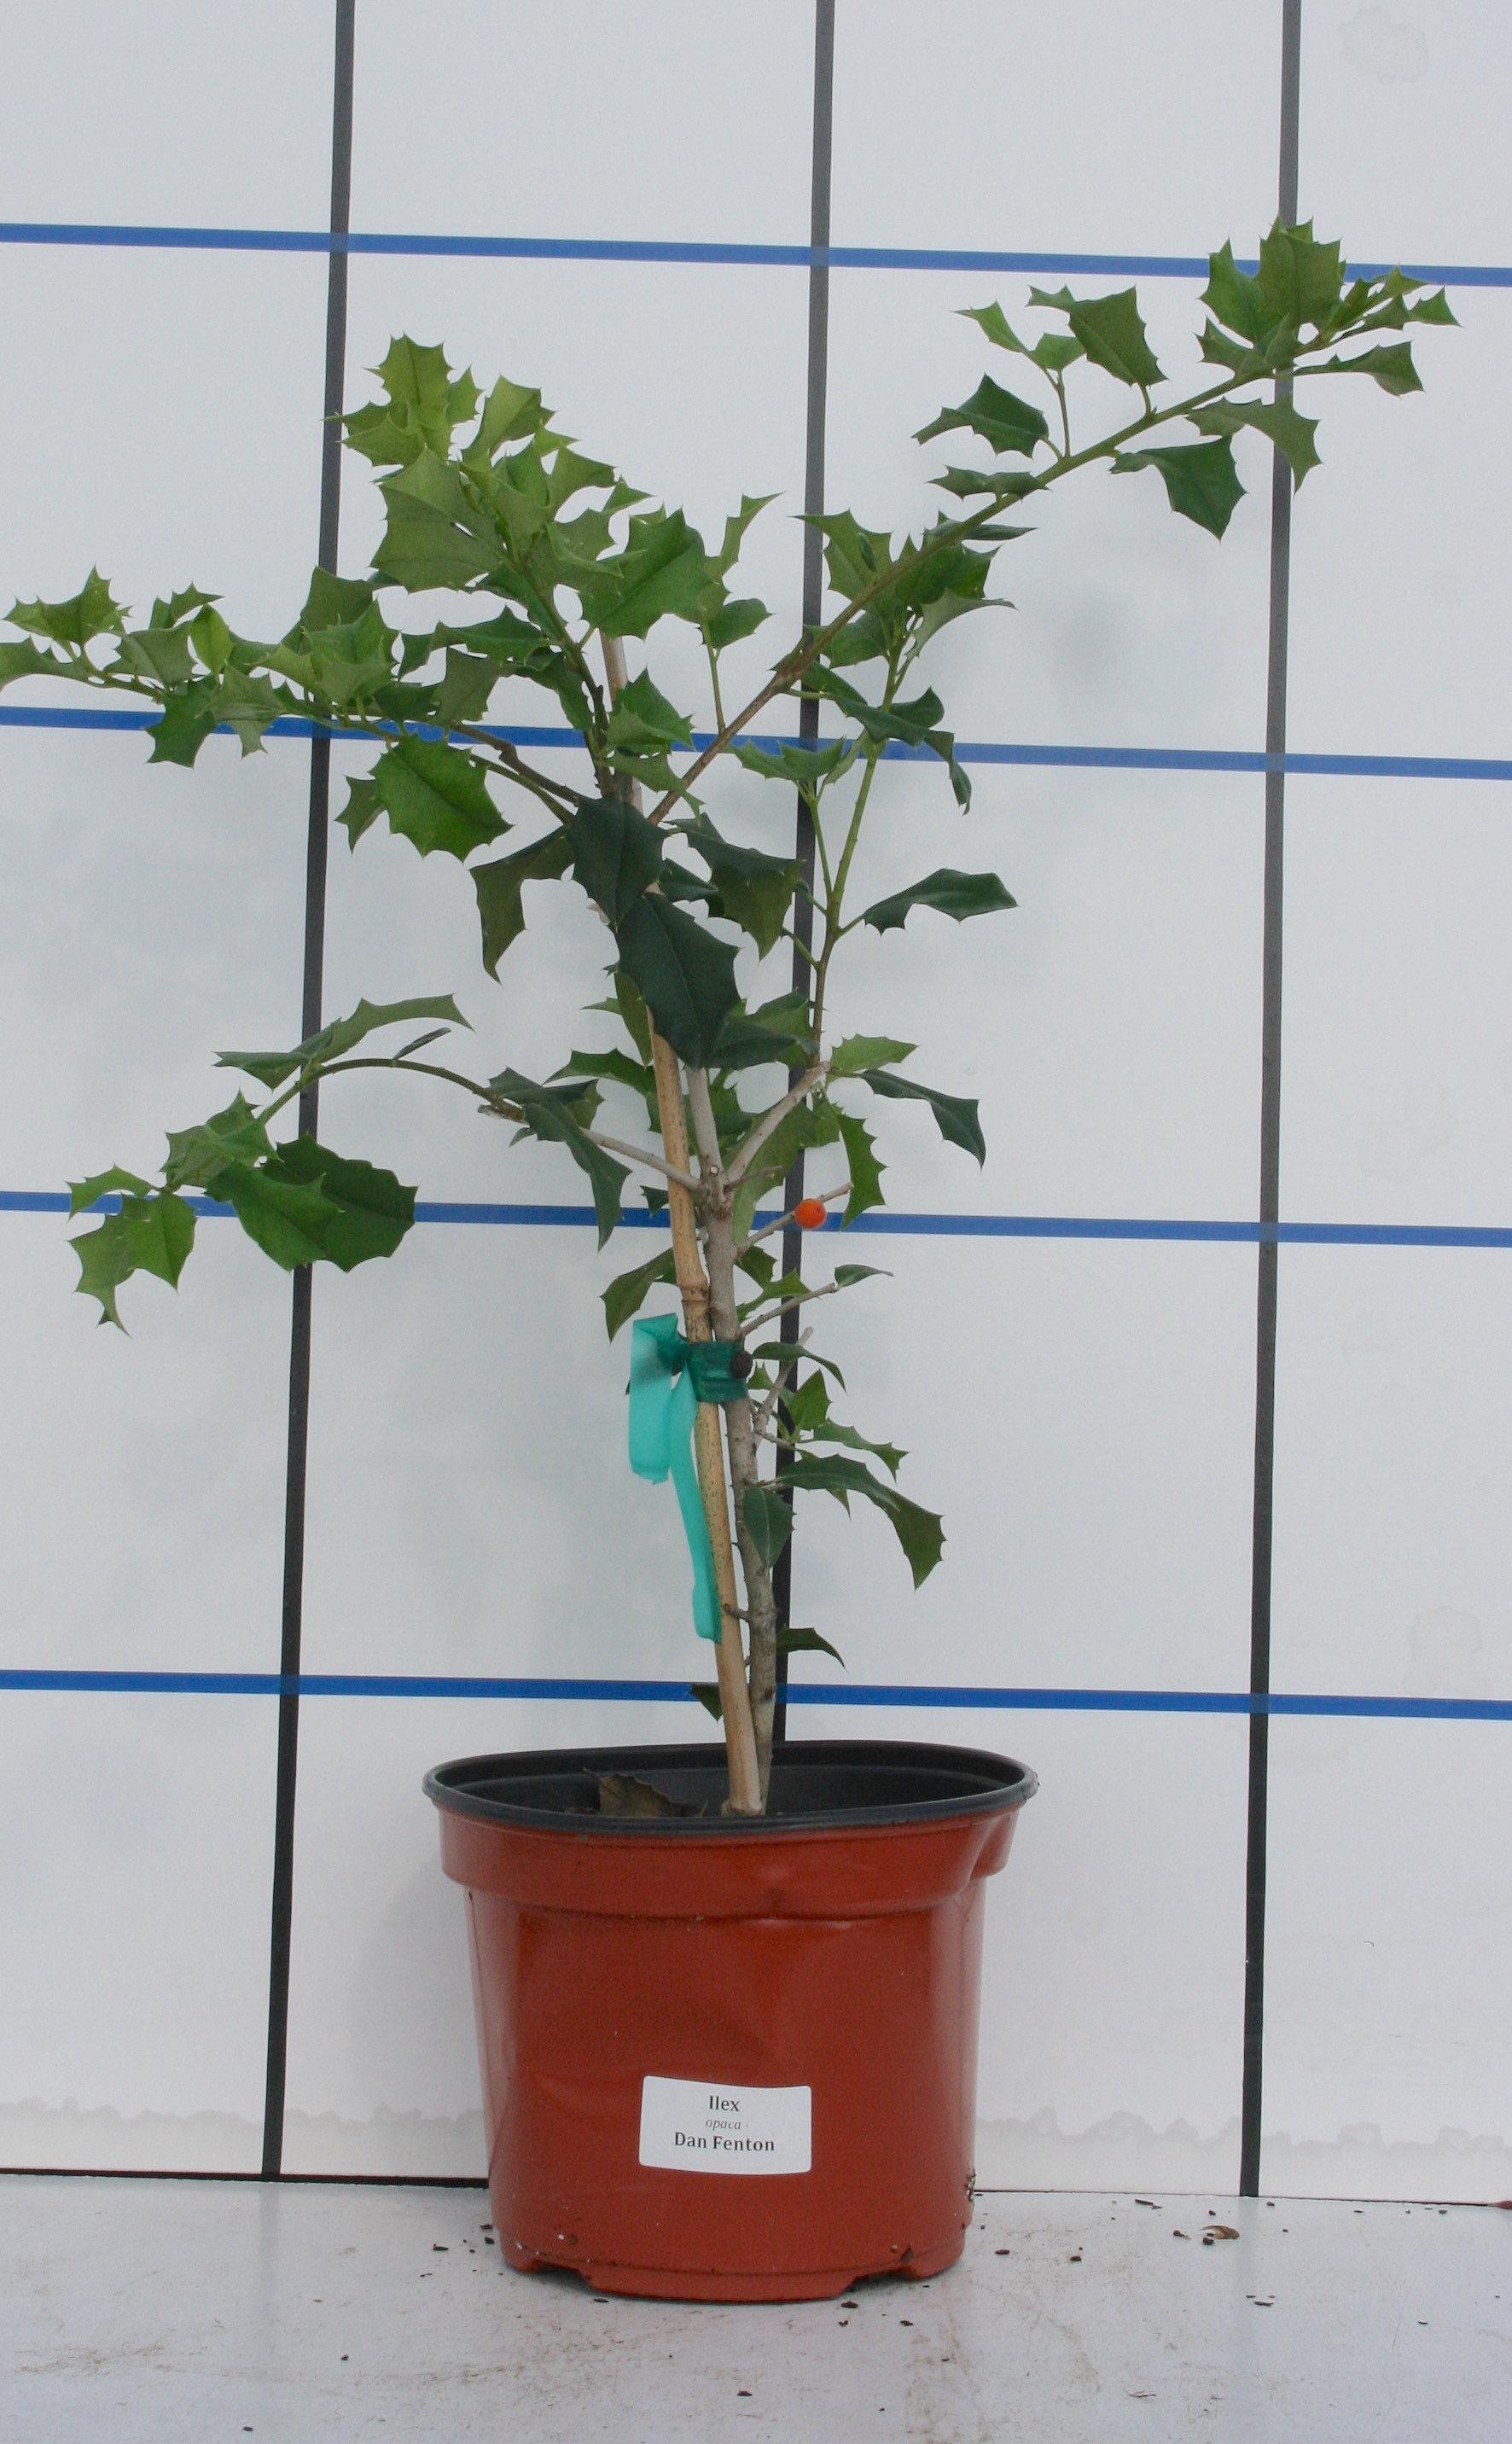 cumberland nurseries ilex dan fenton cumberland nurseries ilex dan fenton